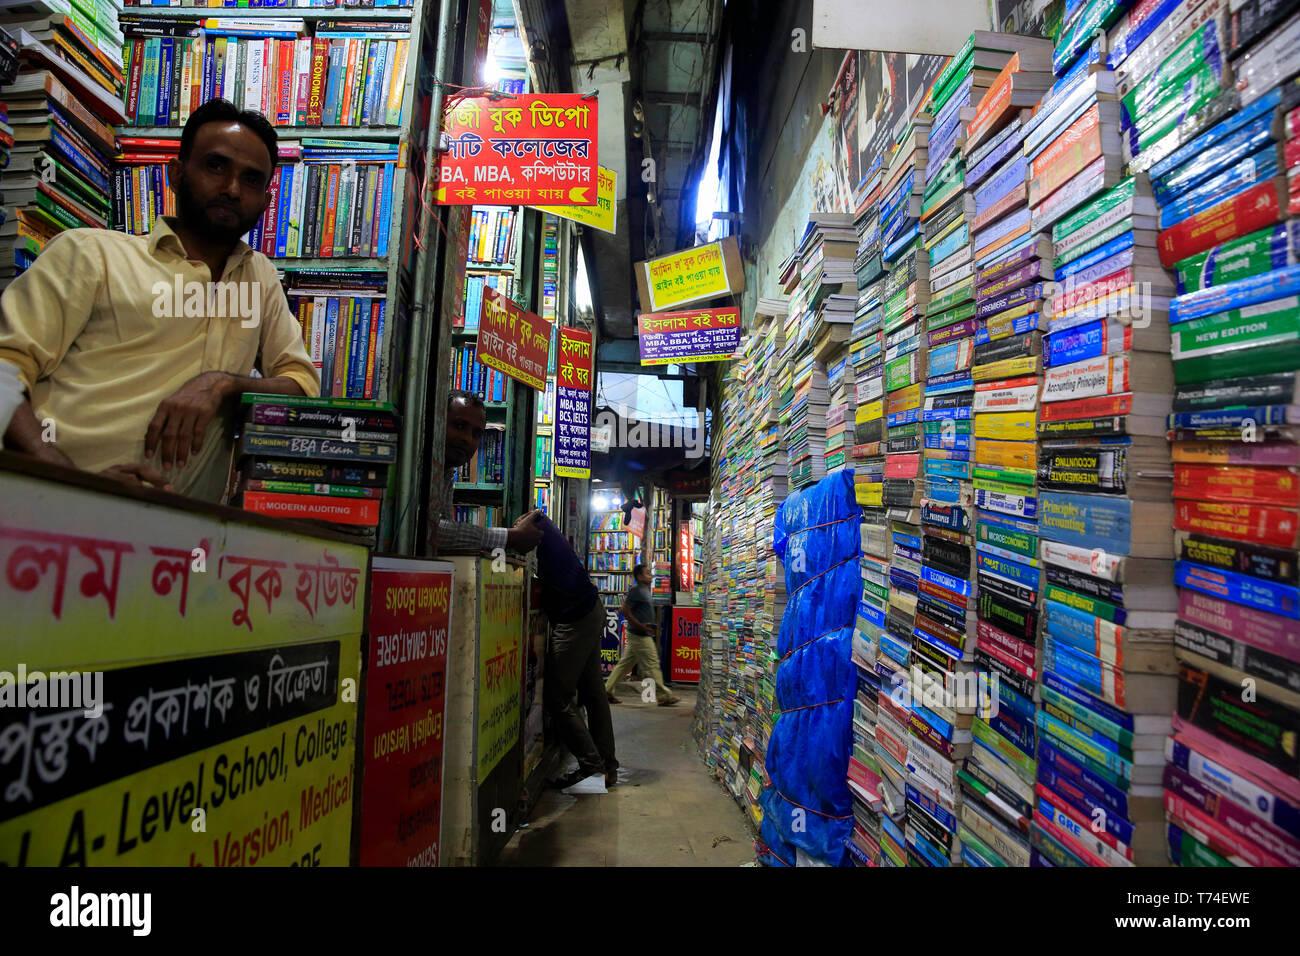 Bookshops at Nilkhet Book Market in Dhaka, Bangladesh - Stock Image